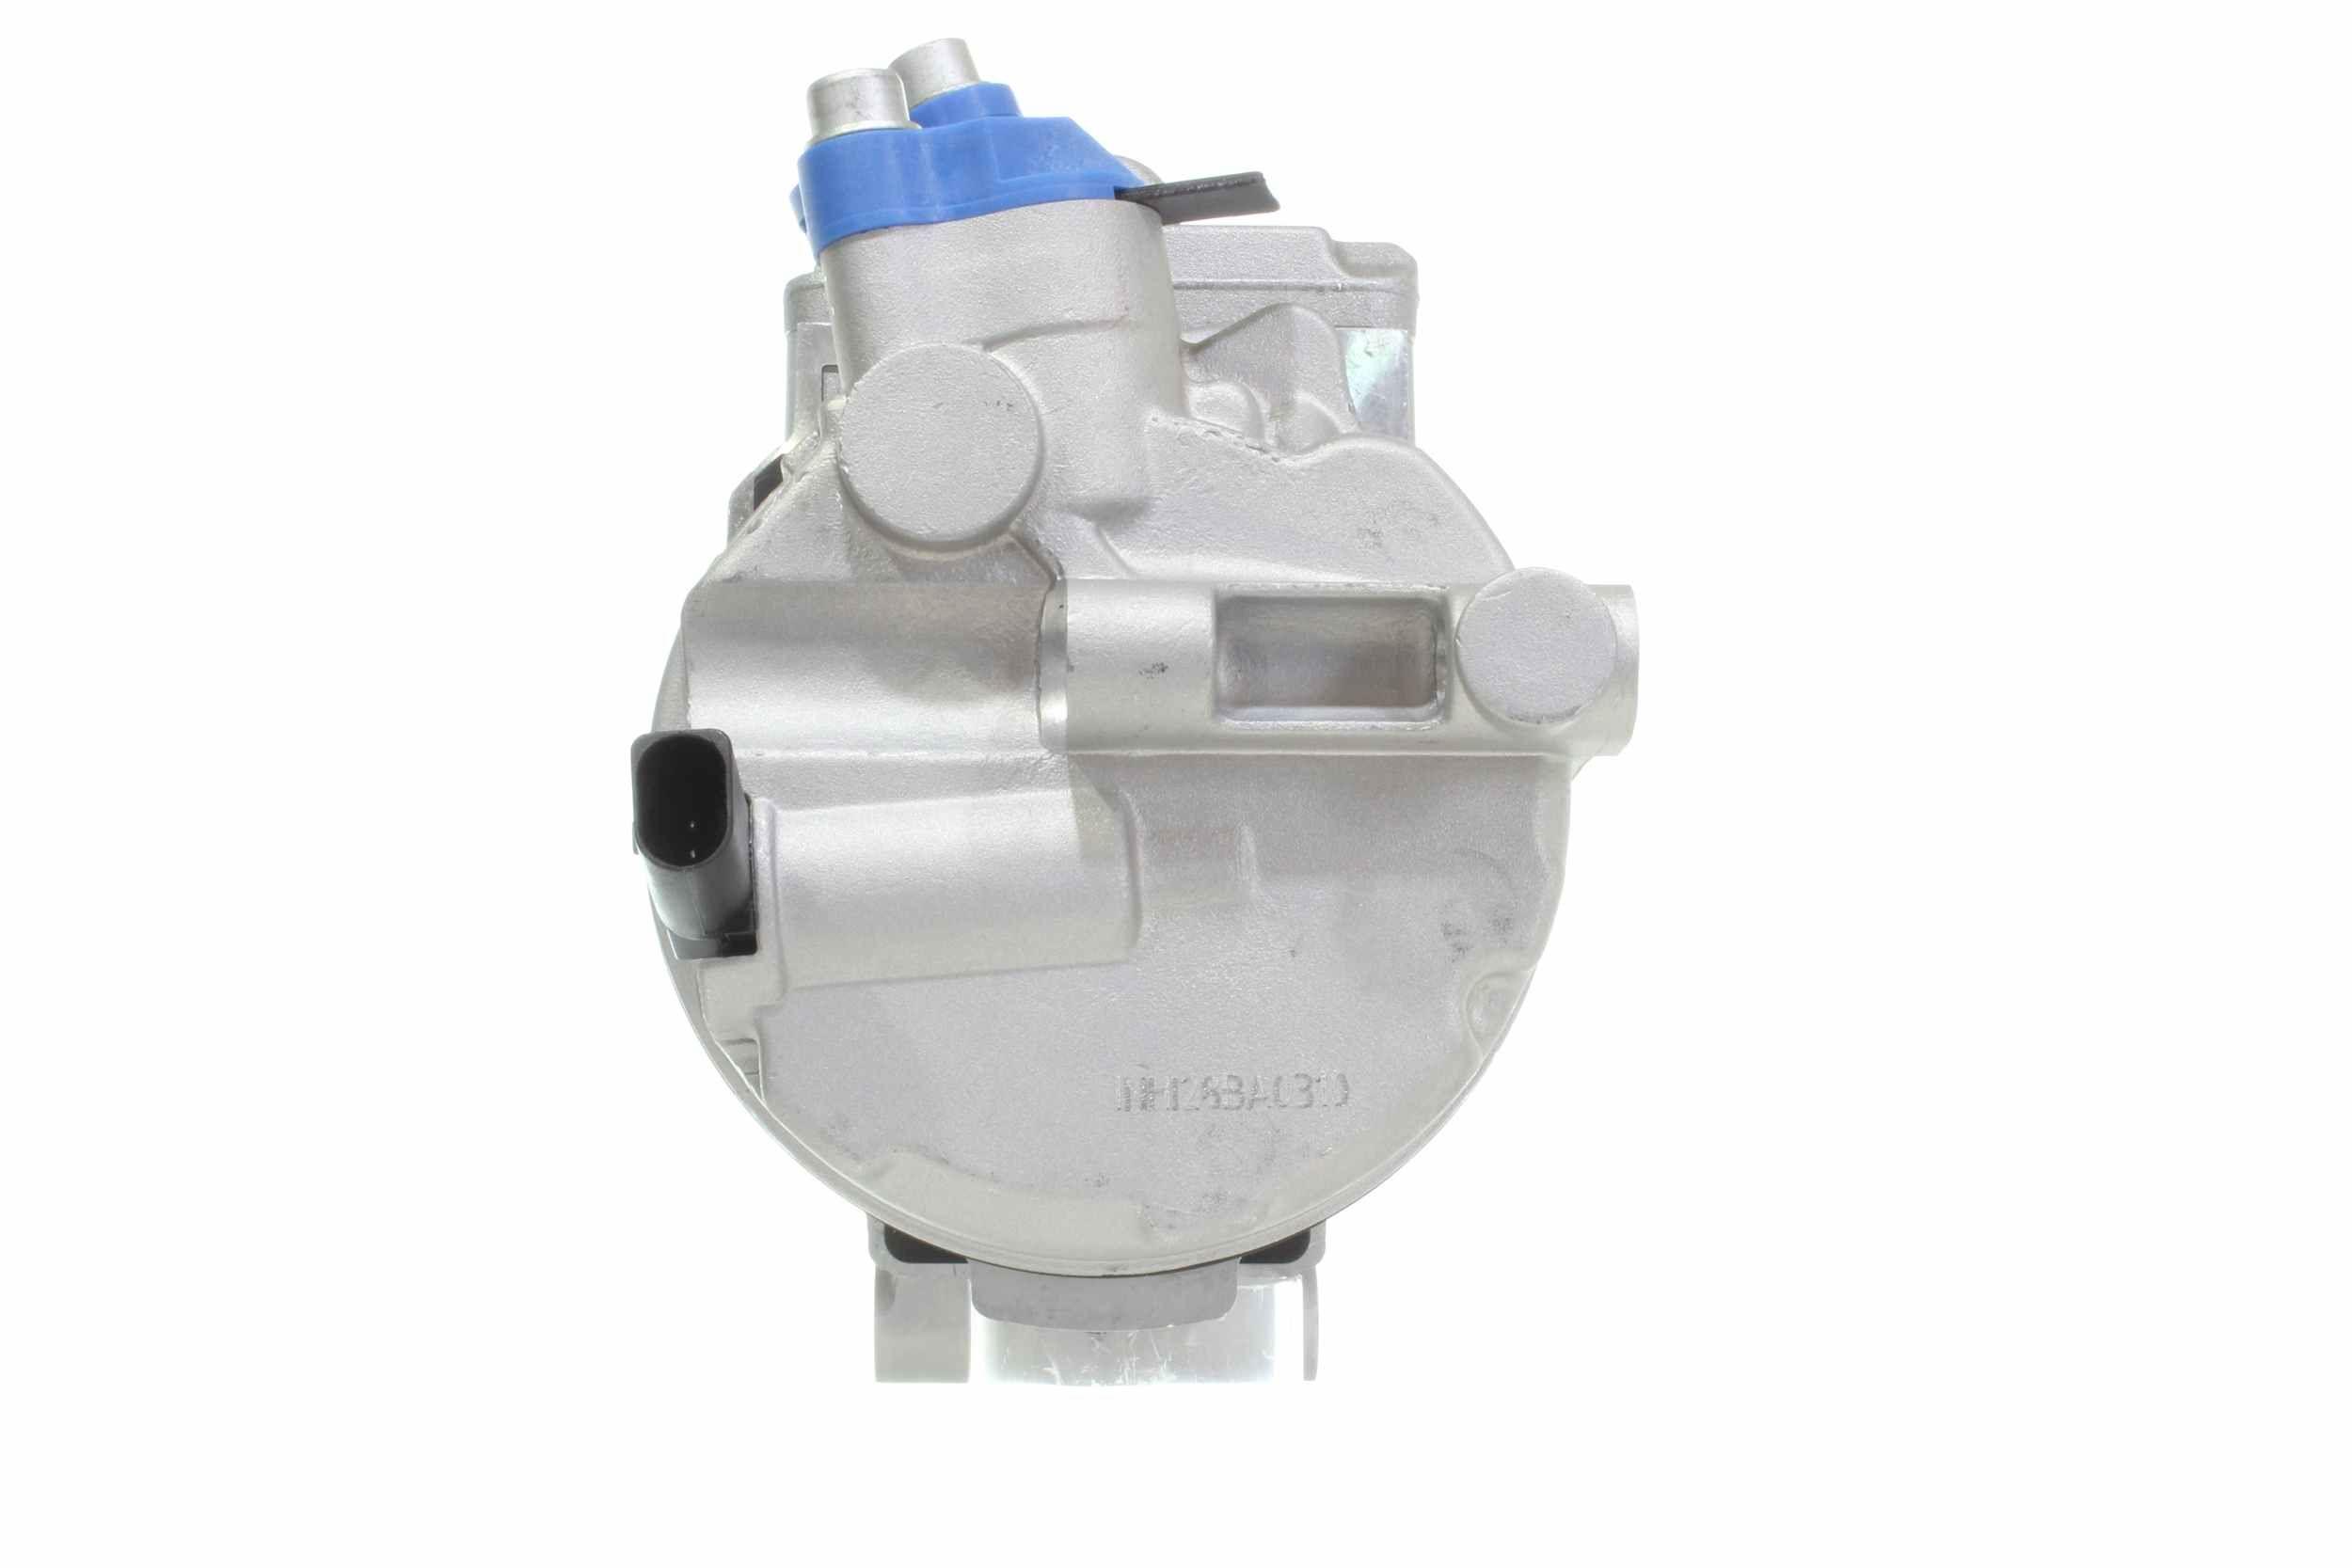 10550744 Kompressor, Klimaanlage ALANKO 550744 - Große Auswahl - stark reduziert